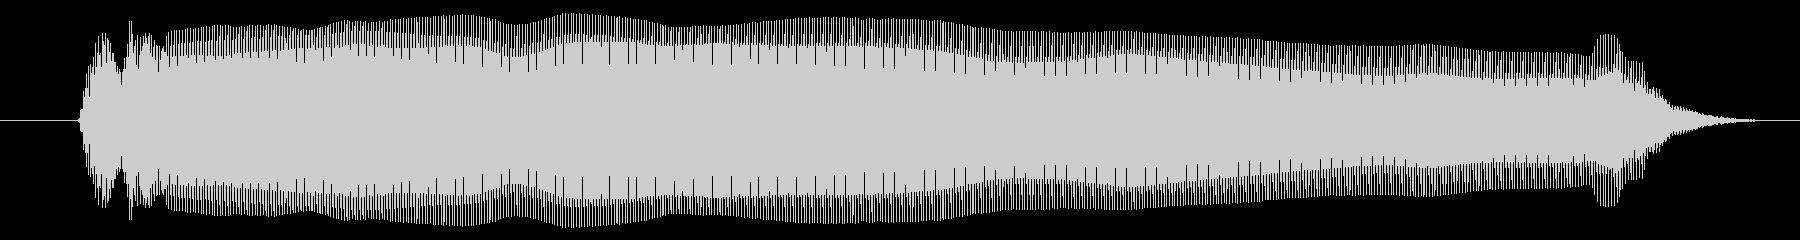 SNES サッカー01-11(ゴール)の未再生の波形